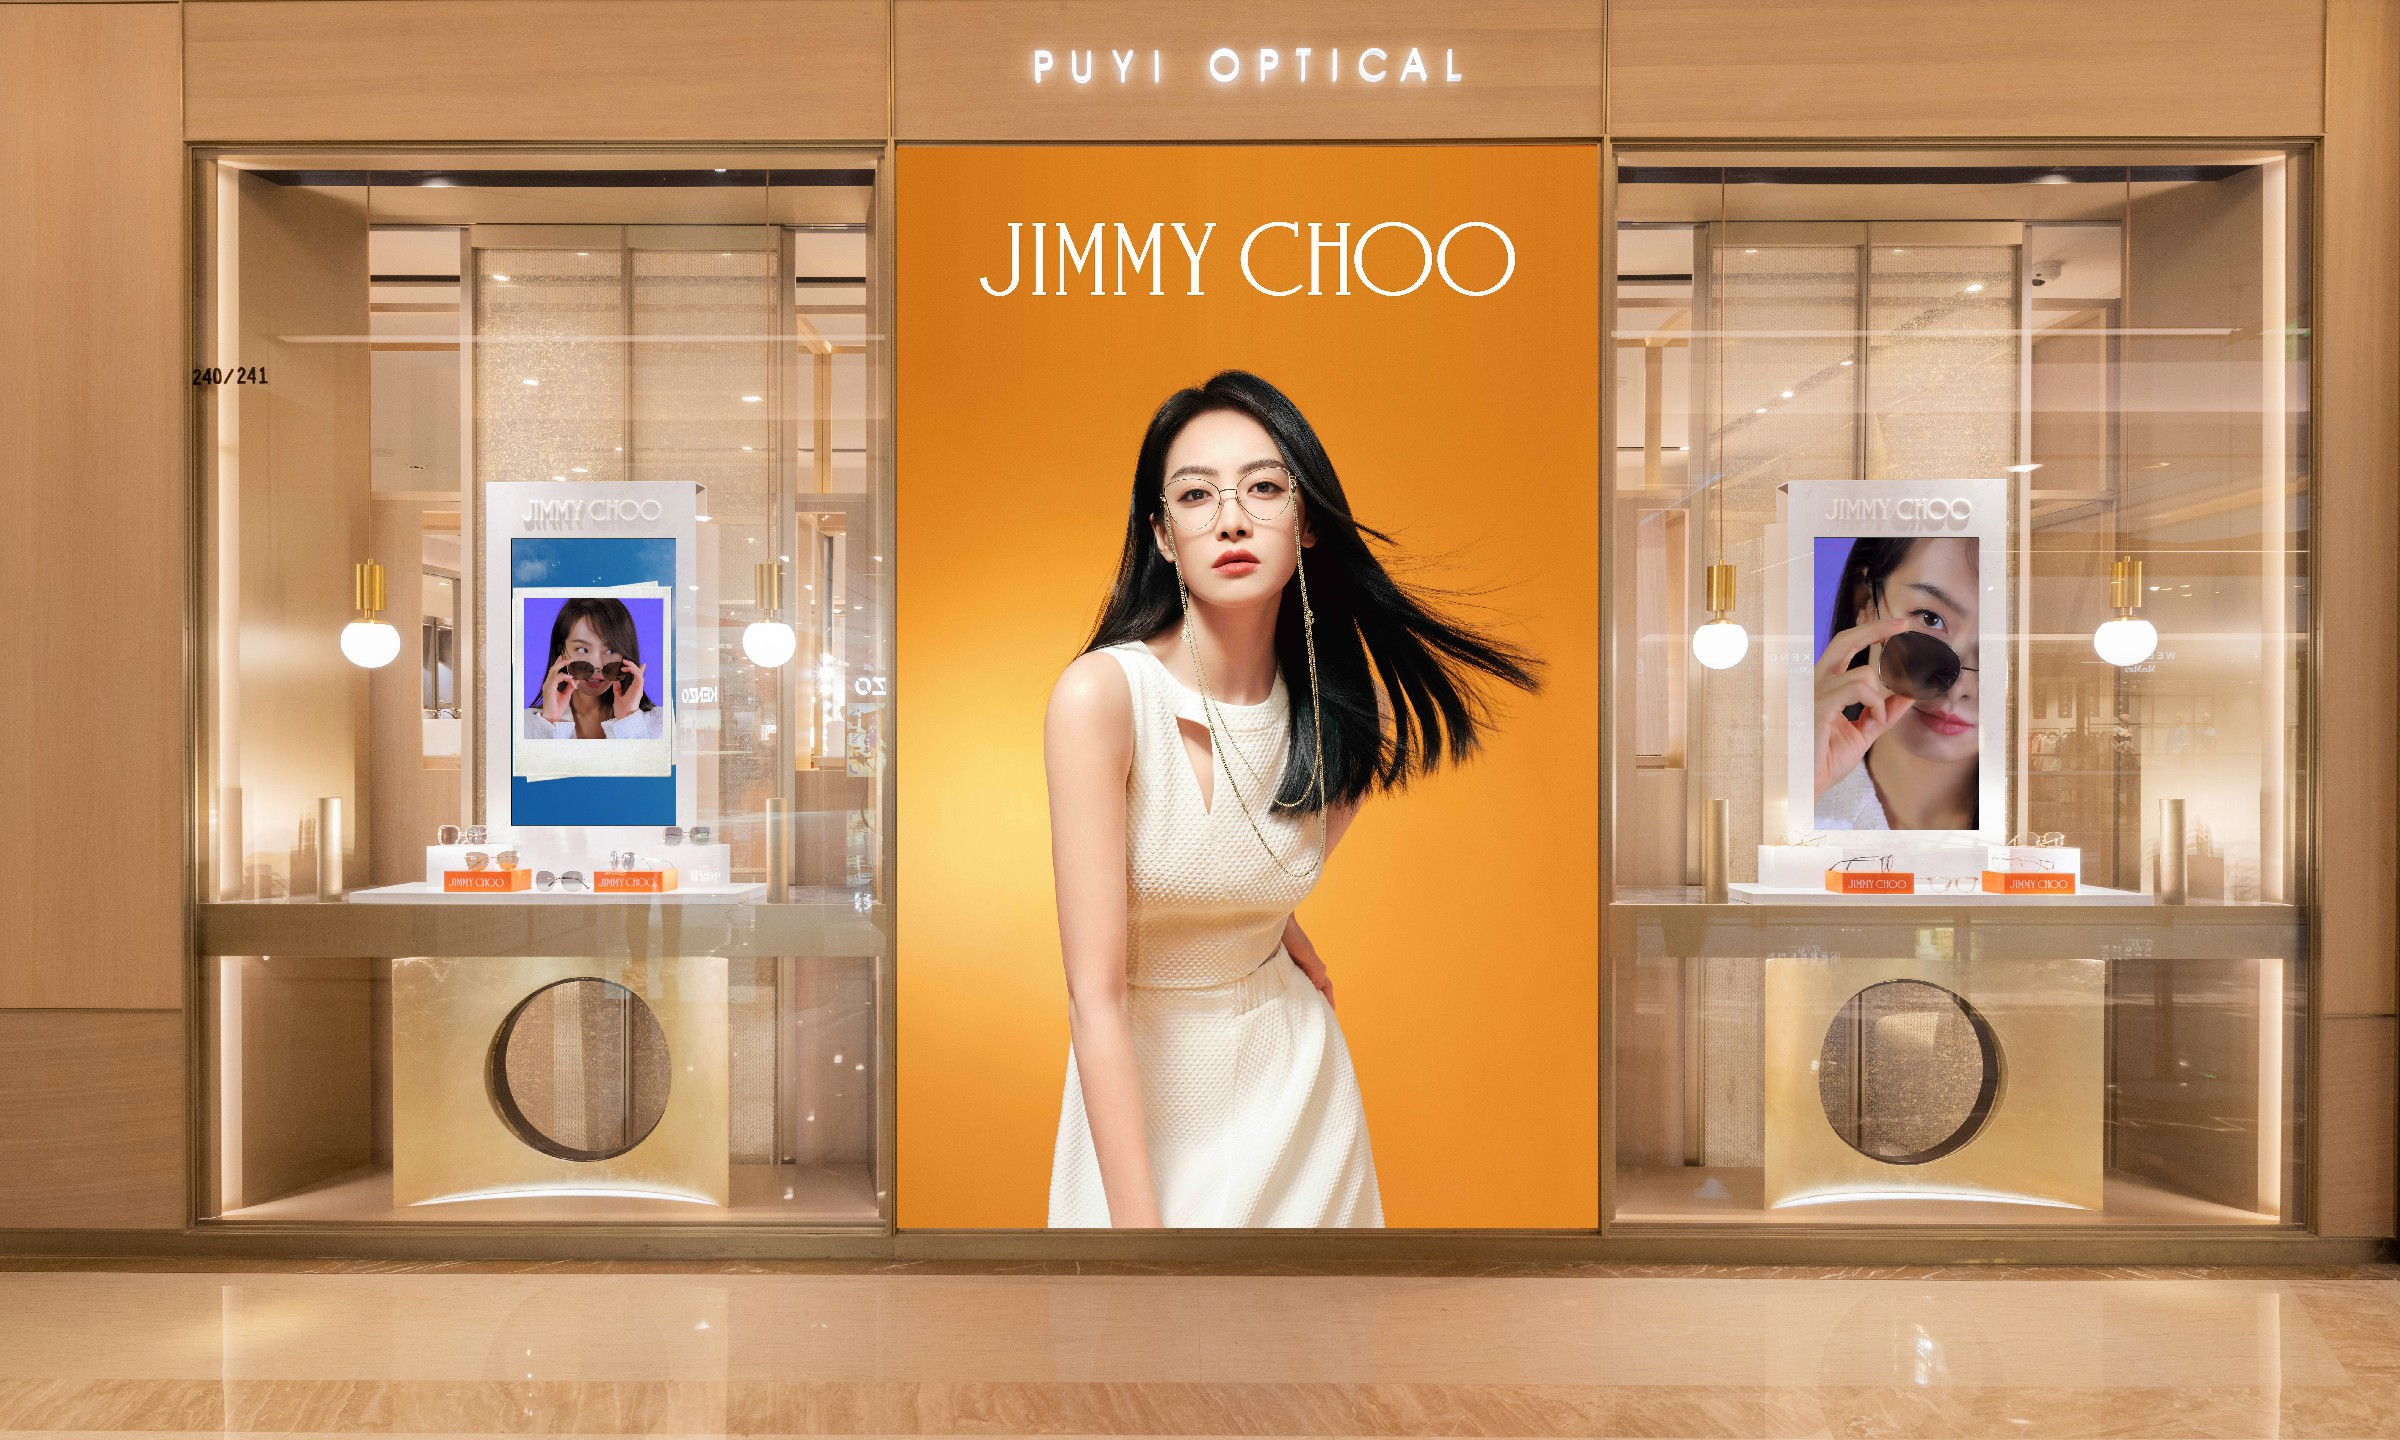 JIMMY CHOO 正式发布 2021 春夏眼镜系列